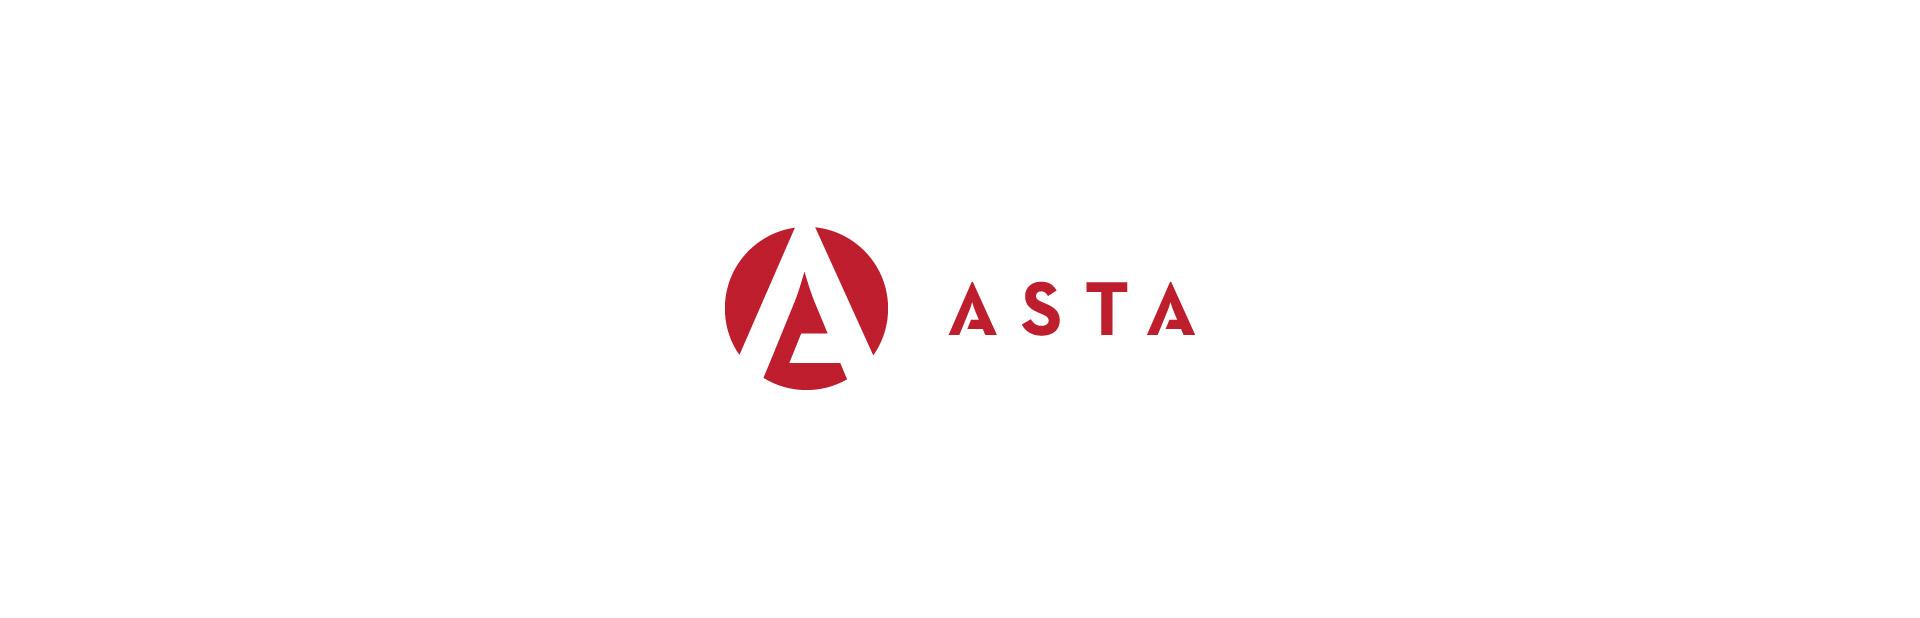 Asta Label | Denpasar, Bali | Self Adhesive Sticker Company | 2017